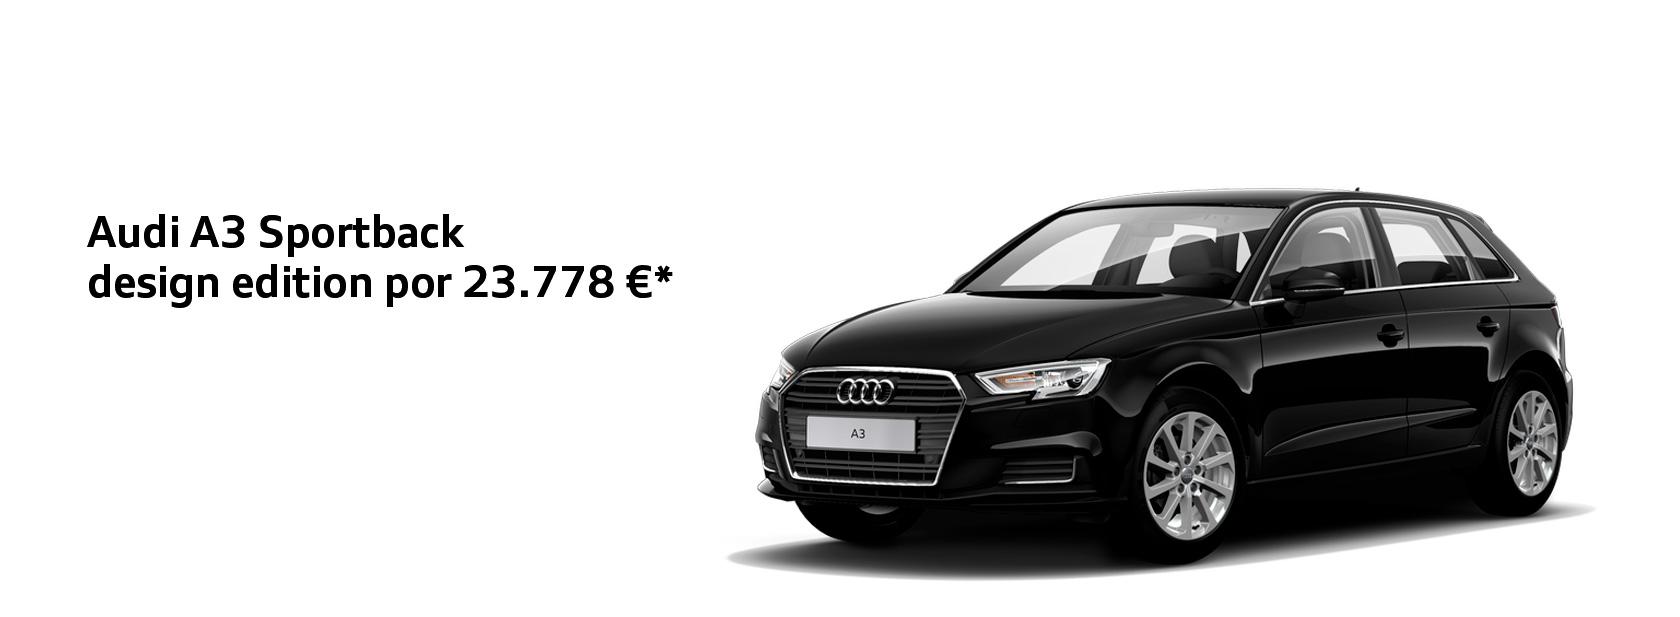 Oferta Audi A3 sportback